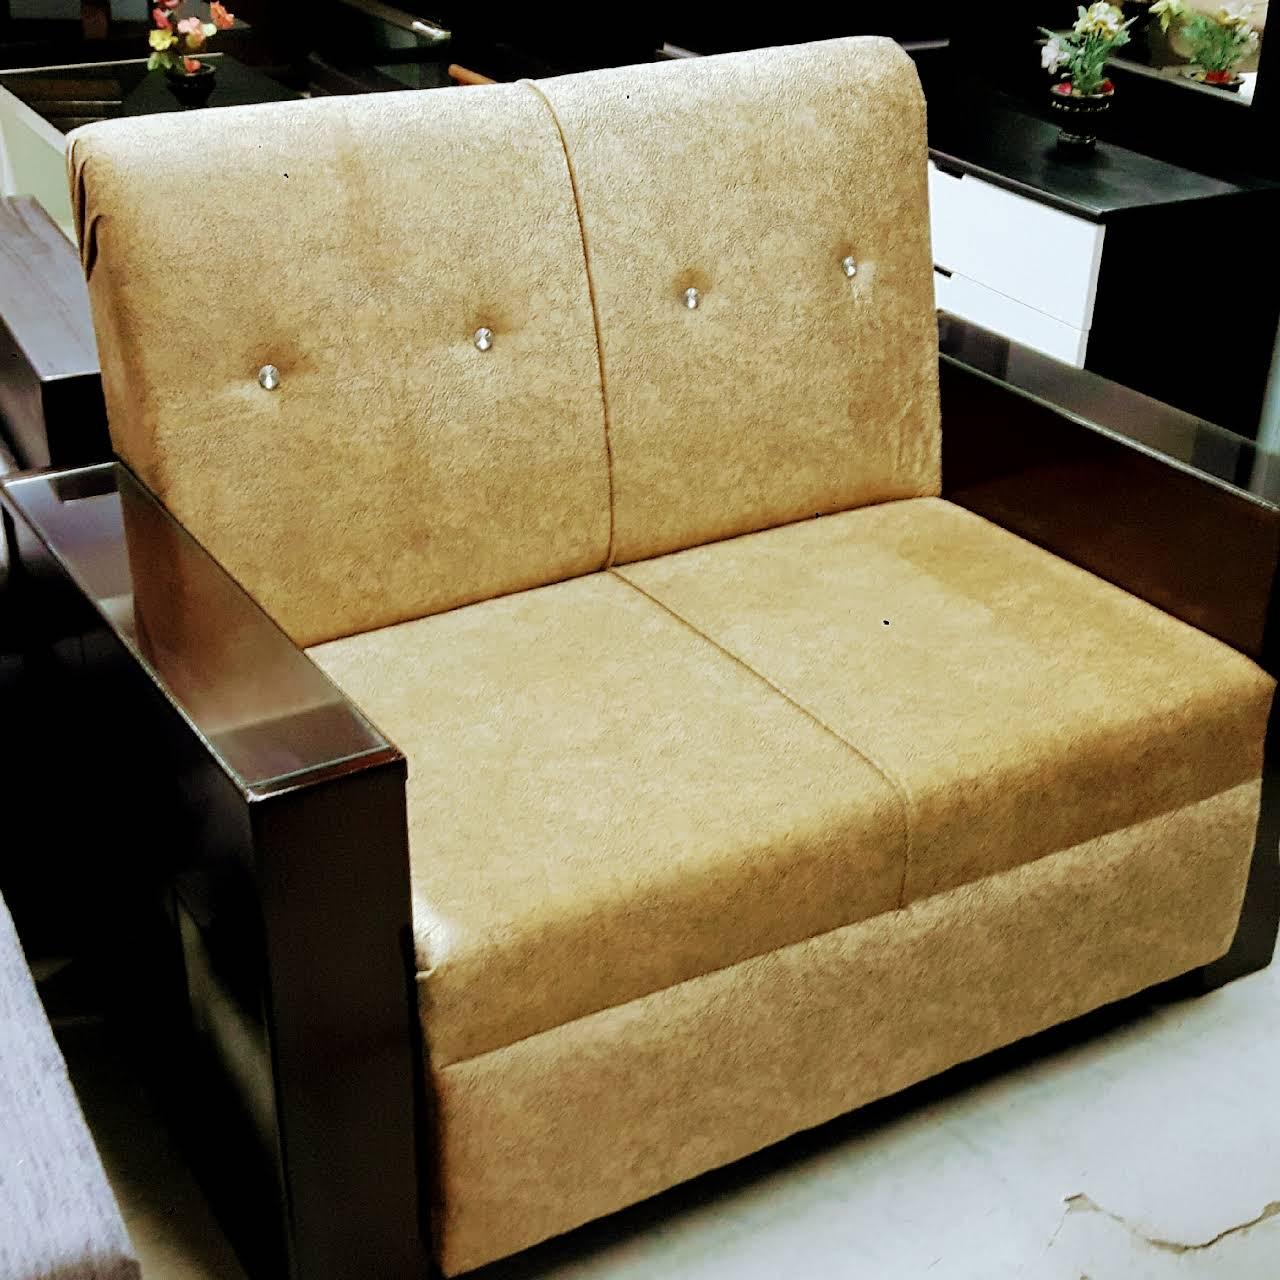 Incredible Decora Furniture Furniture Shop In Bareilly Machost Co Dining Chair Design Ideas Machostcouk